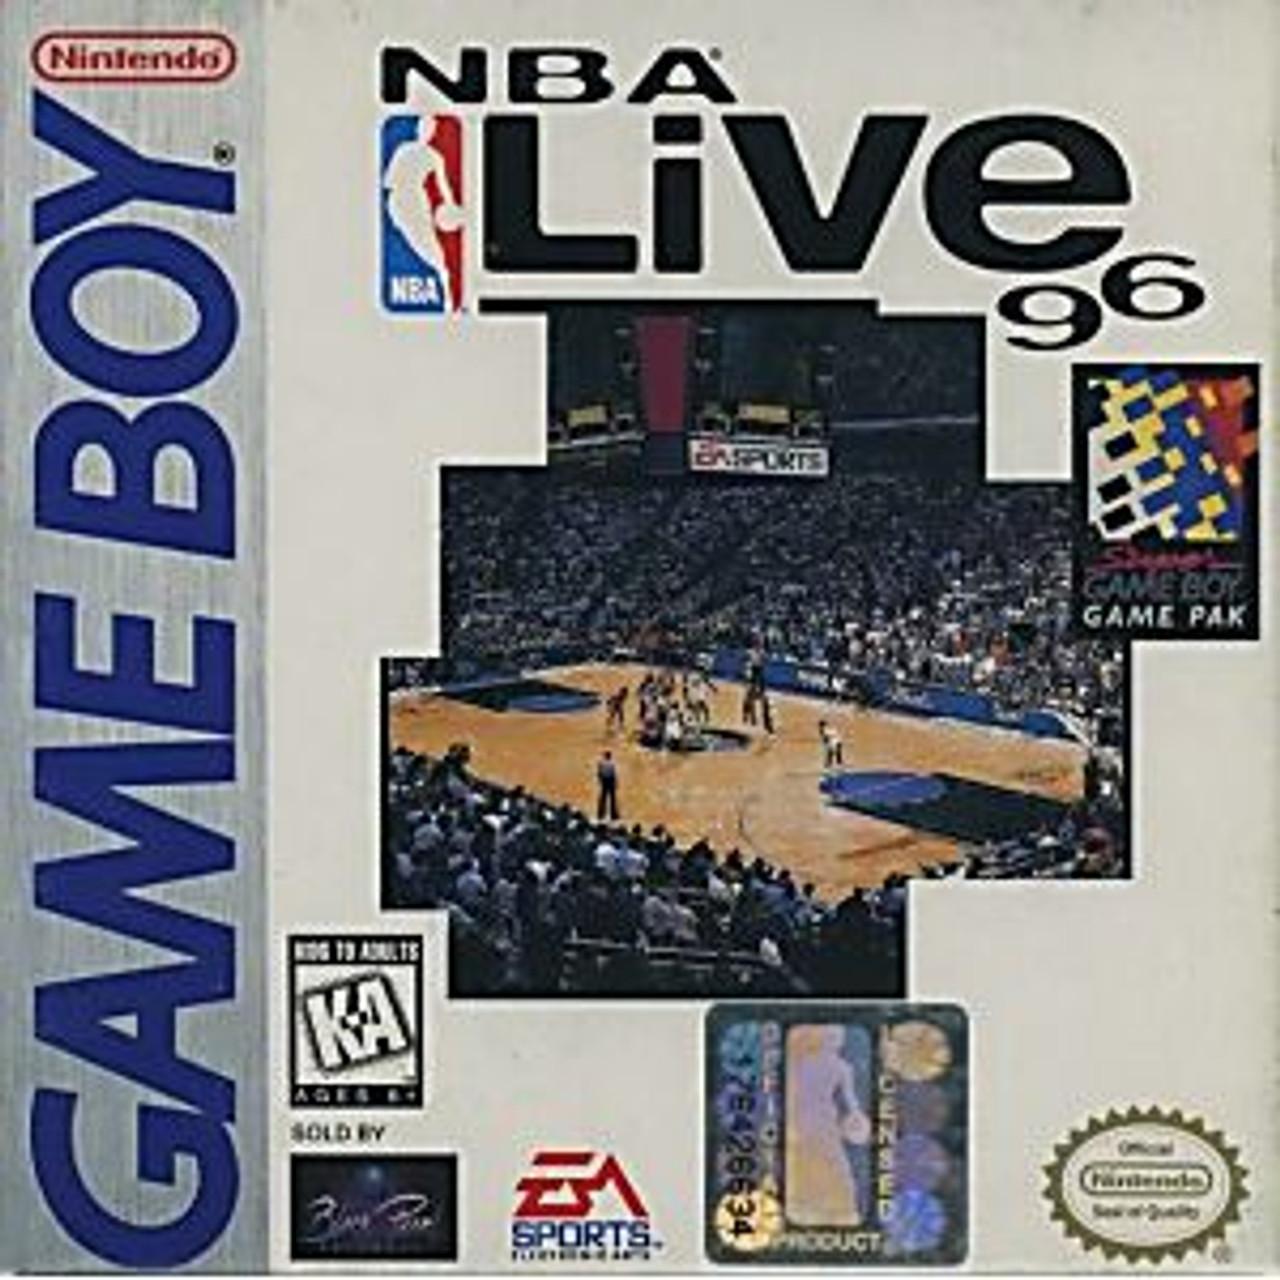 NBA LIVE 96 - GB